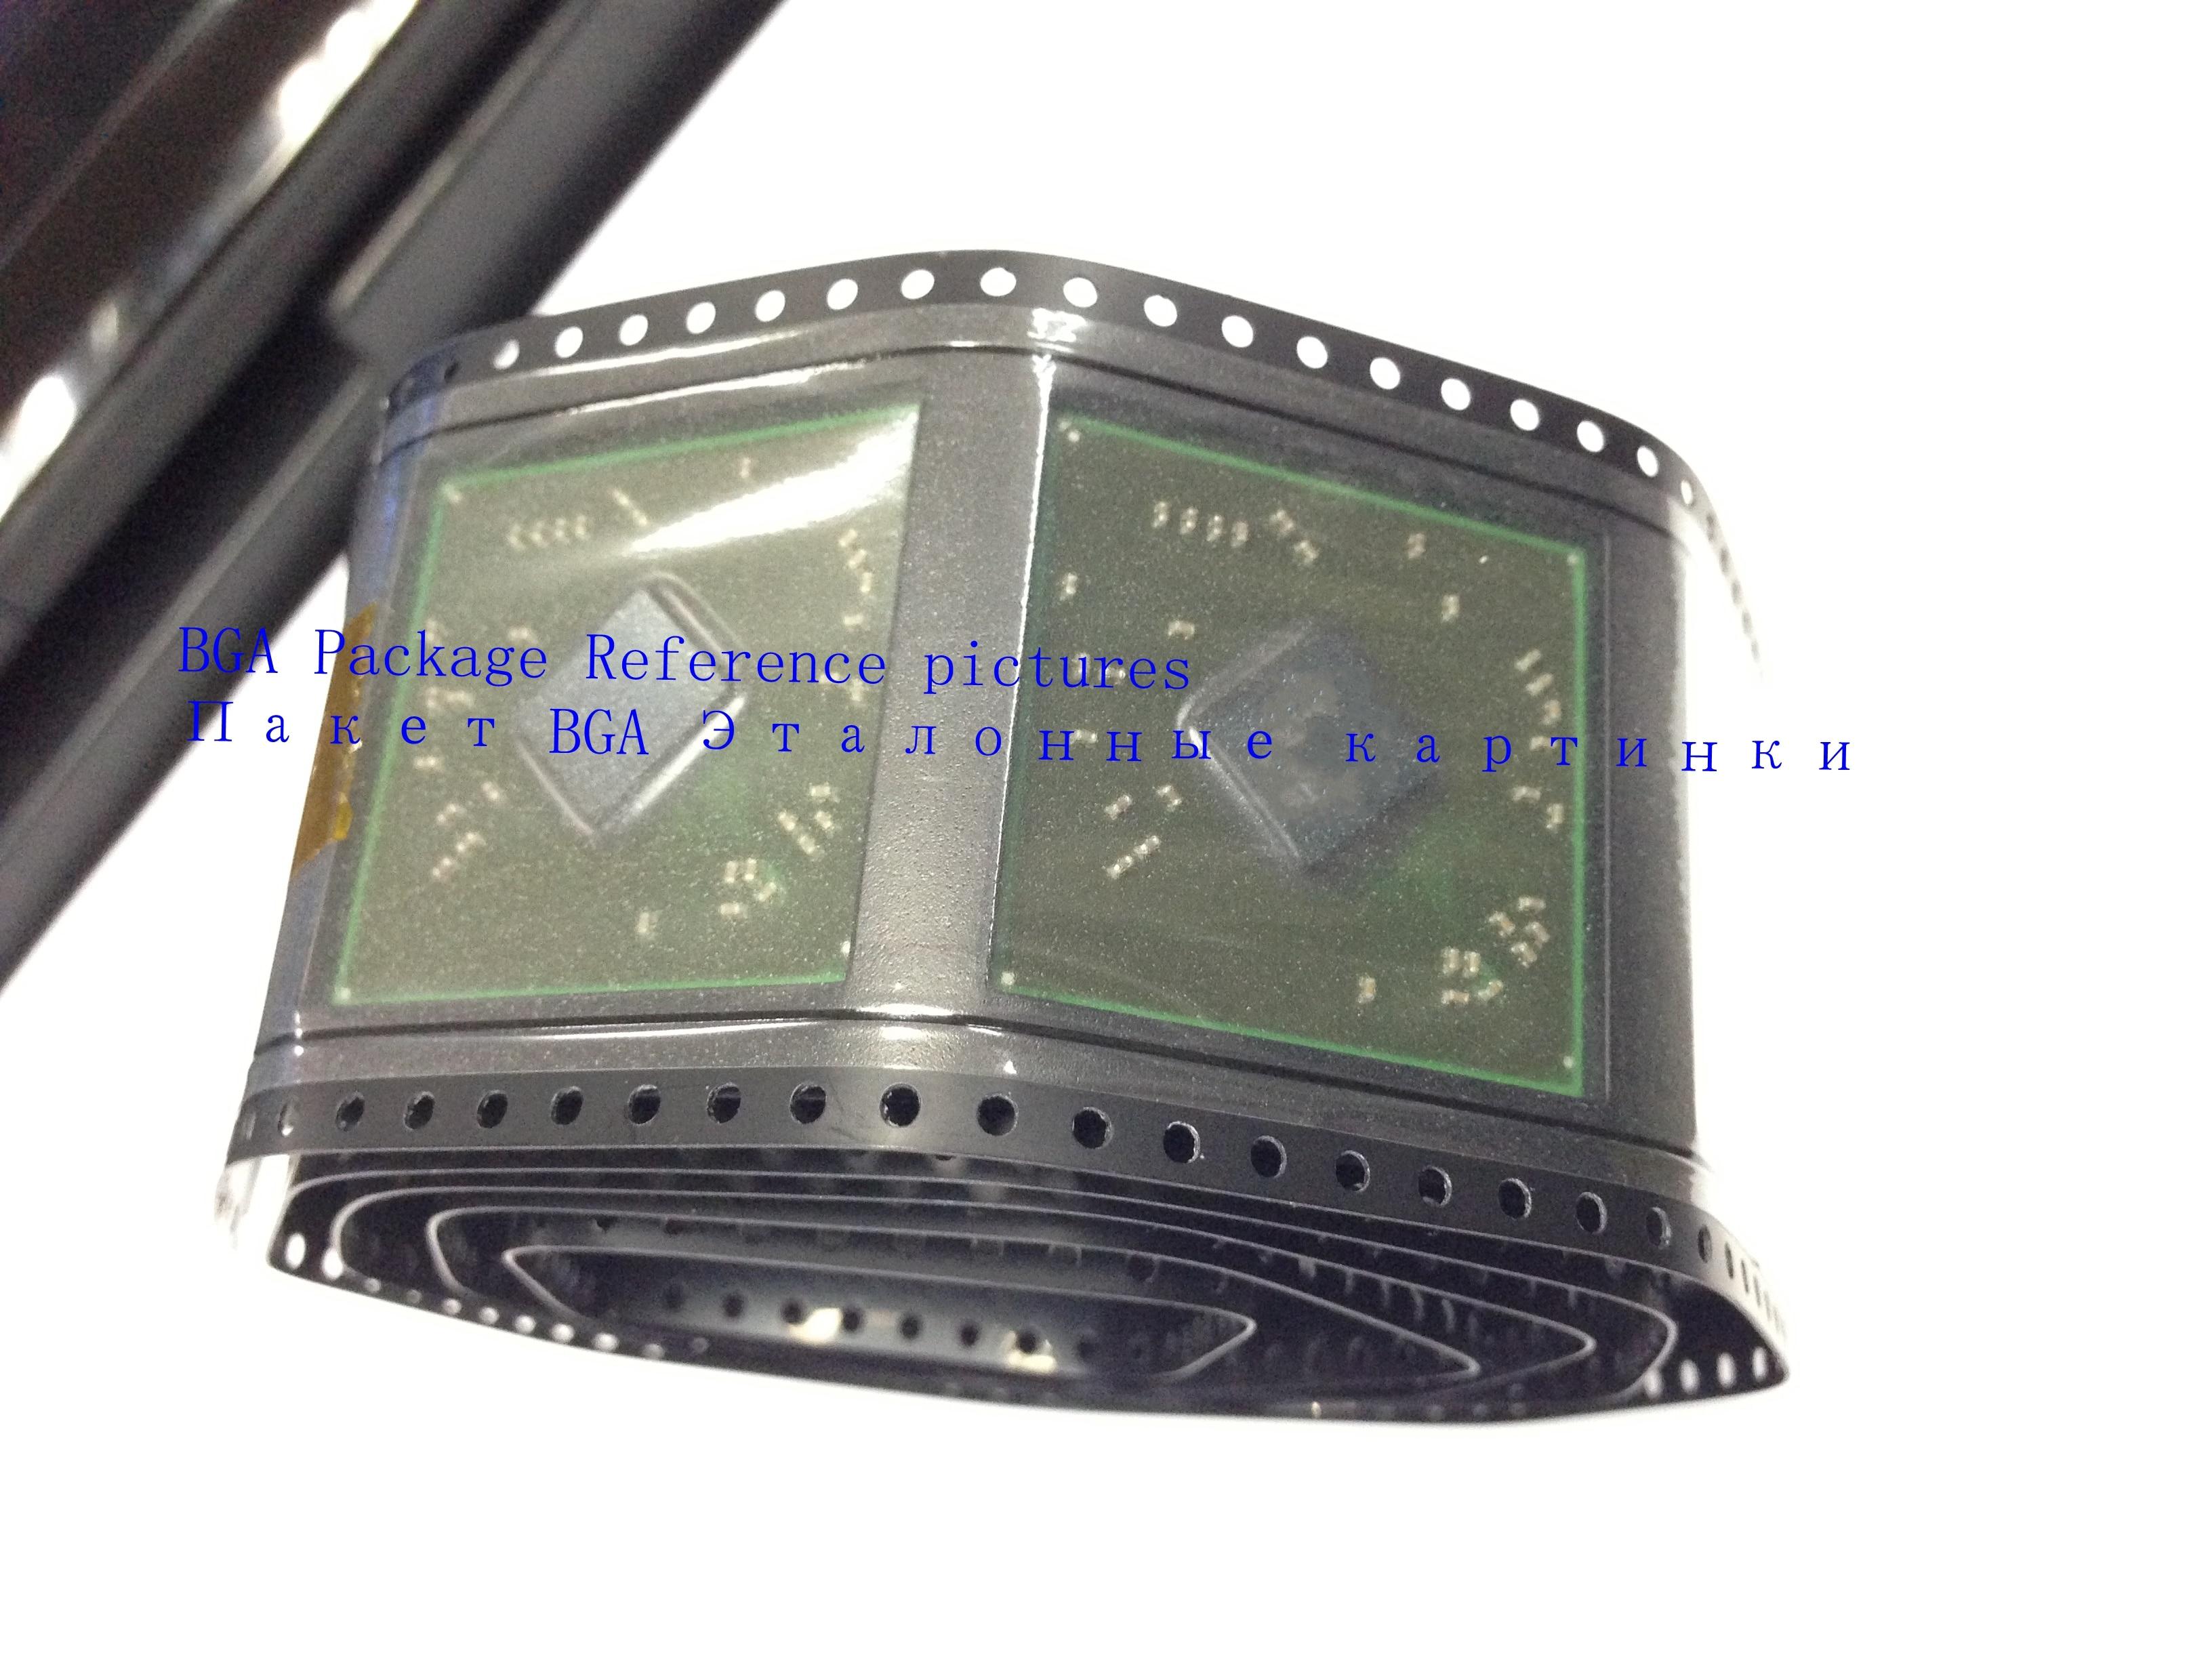 1pcs/lot 100% New N12E-GE2-A1 N12E GE2 A1 BGA Chipset1pcs/lot 100% New N12E-GE2-A1 N12E GE2 A1 BGA Chipset